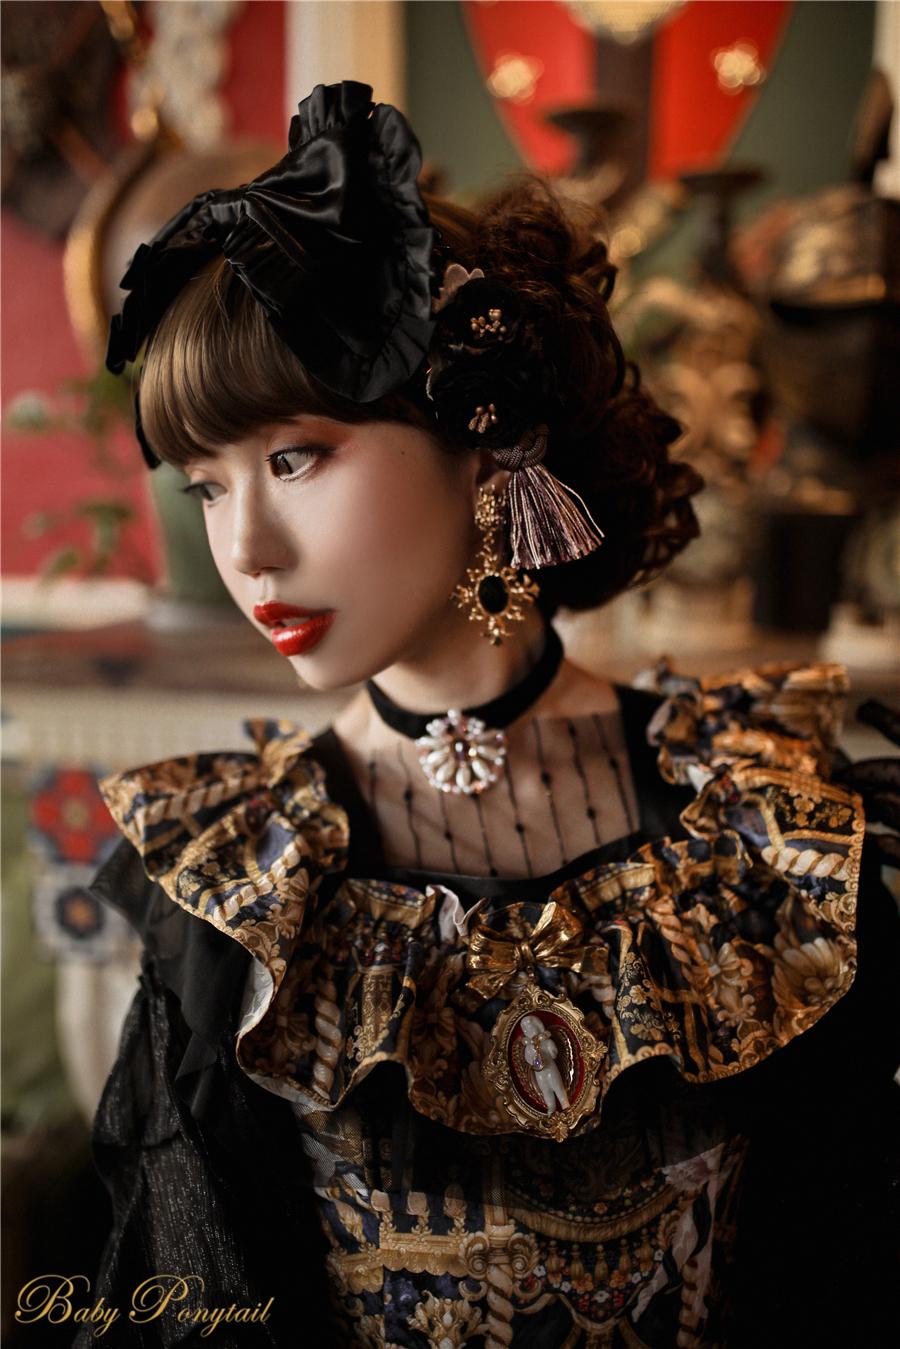 Babyponytail_Model_Ruffle Collar JSK_Black Present Angel_Kaka_18.jpg